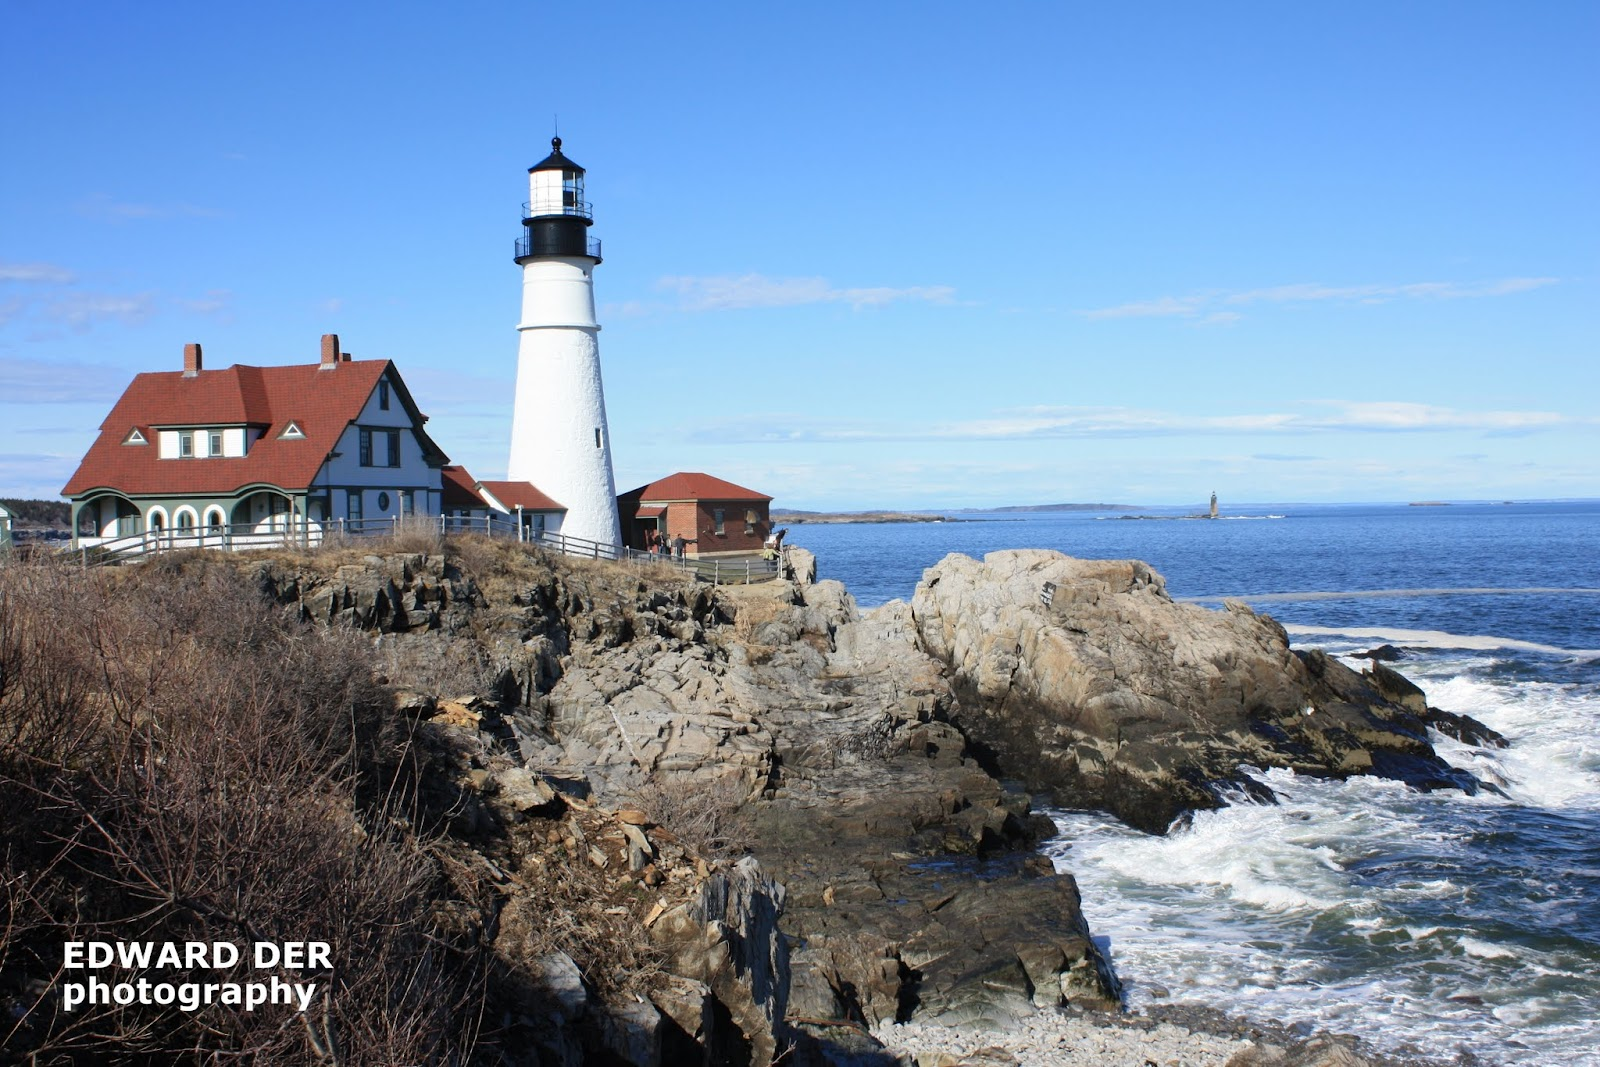 edward der photography: Scenic Portland, Maine